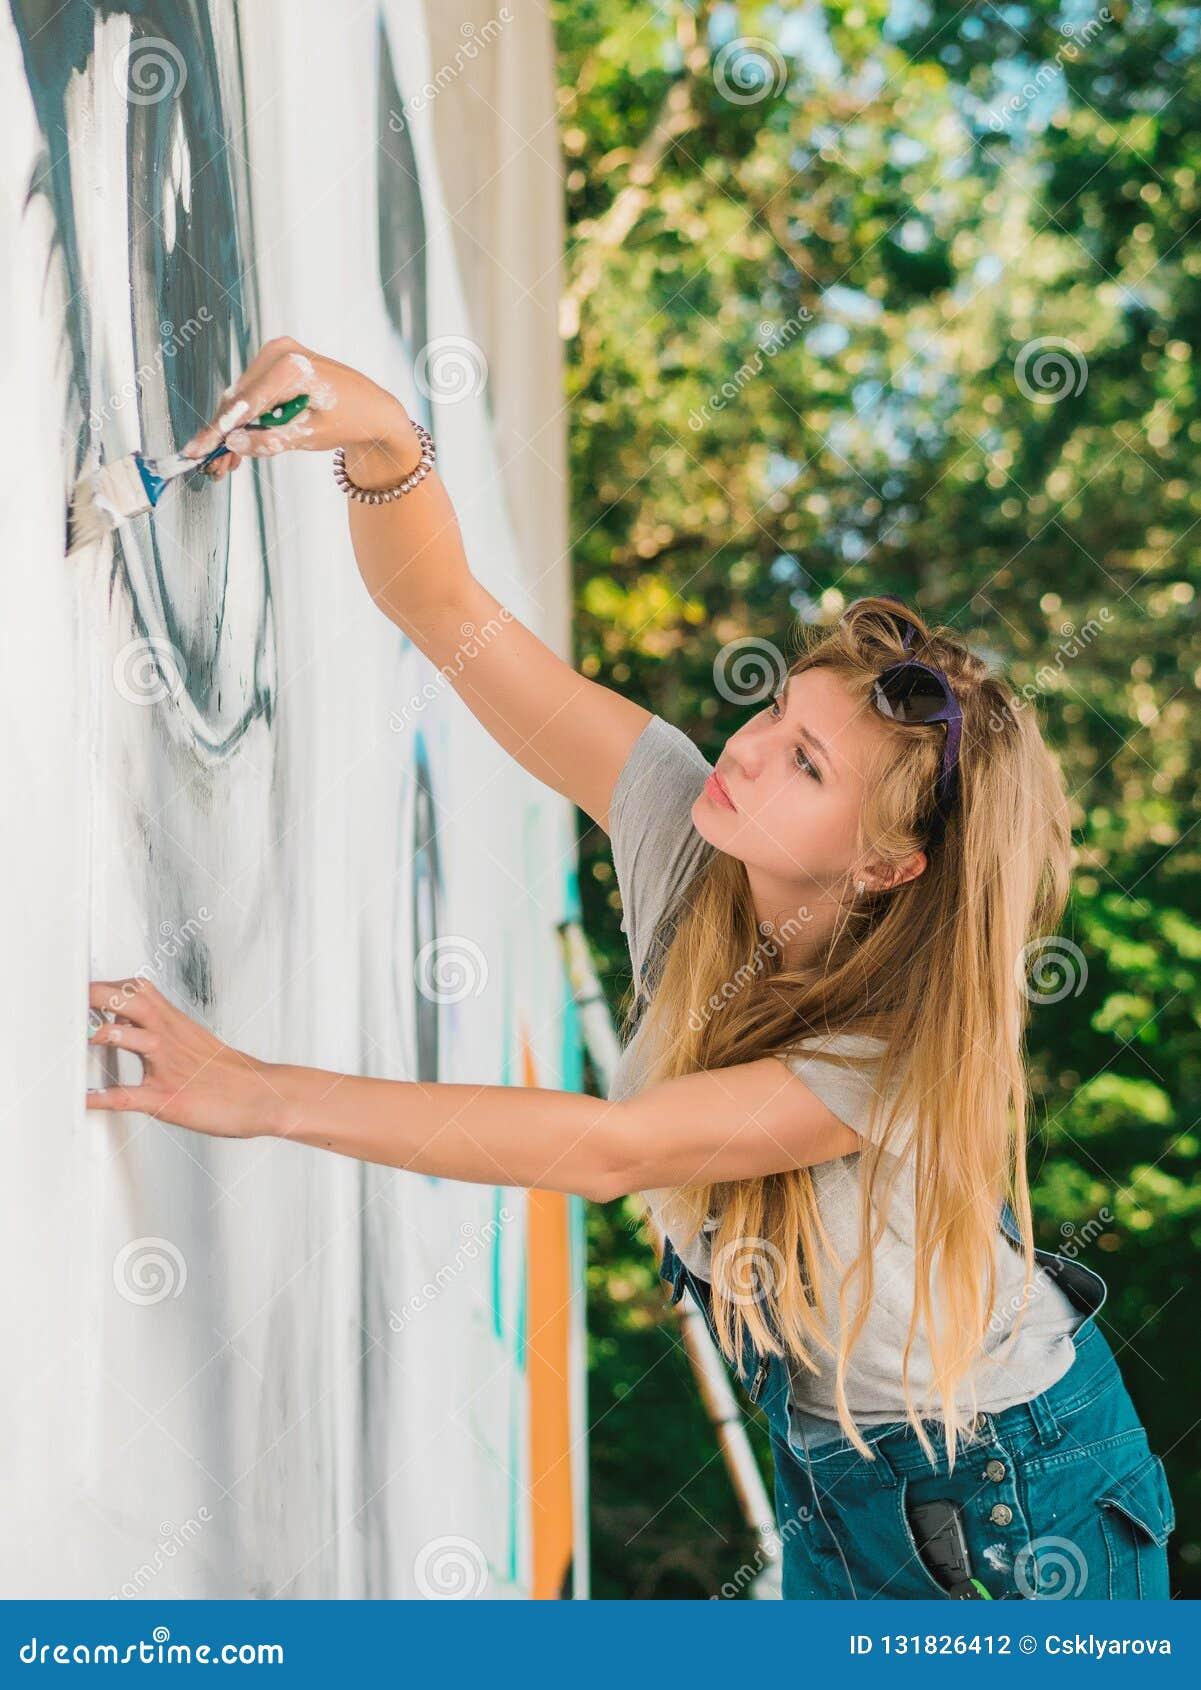 Beautiful Girl Making Graffiti Of Big Female Face With ...